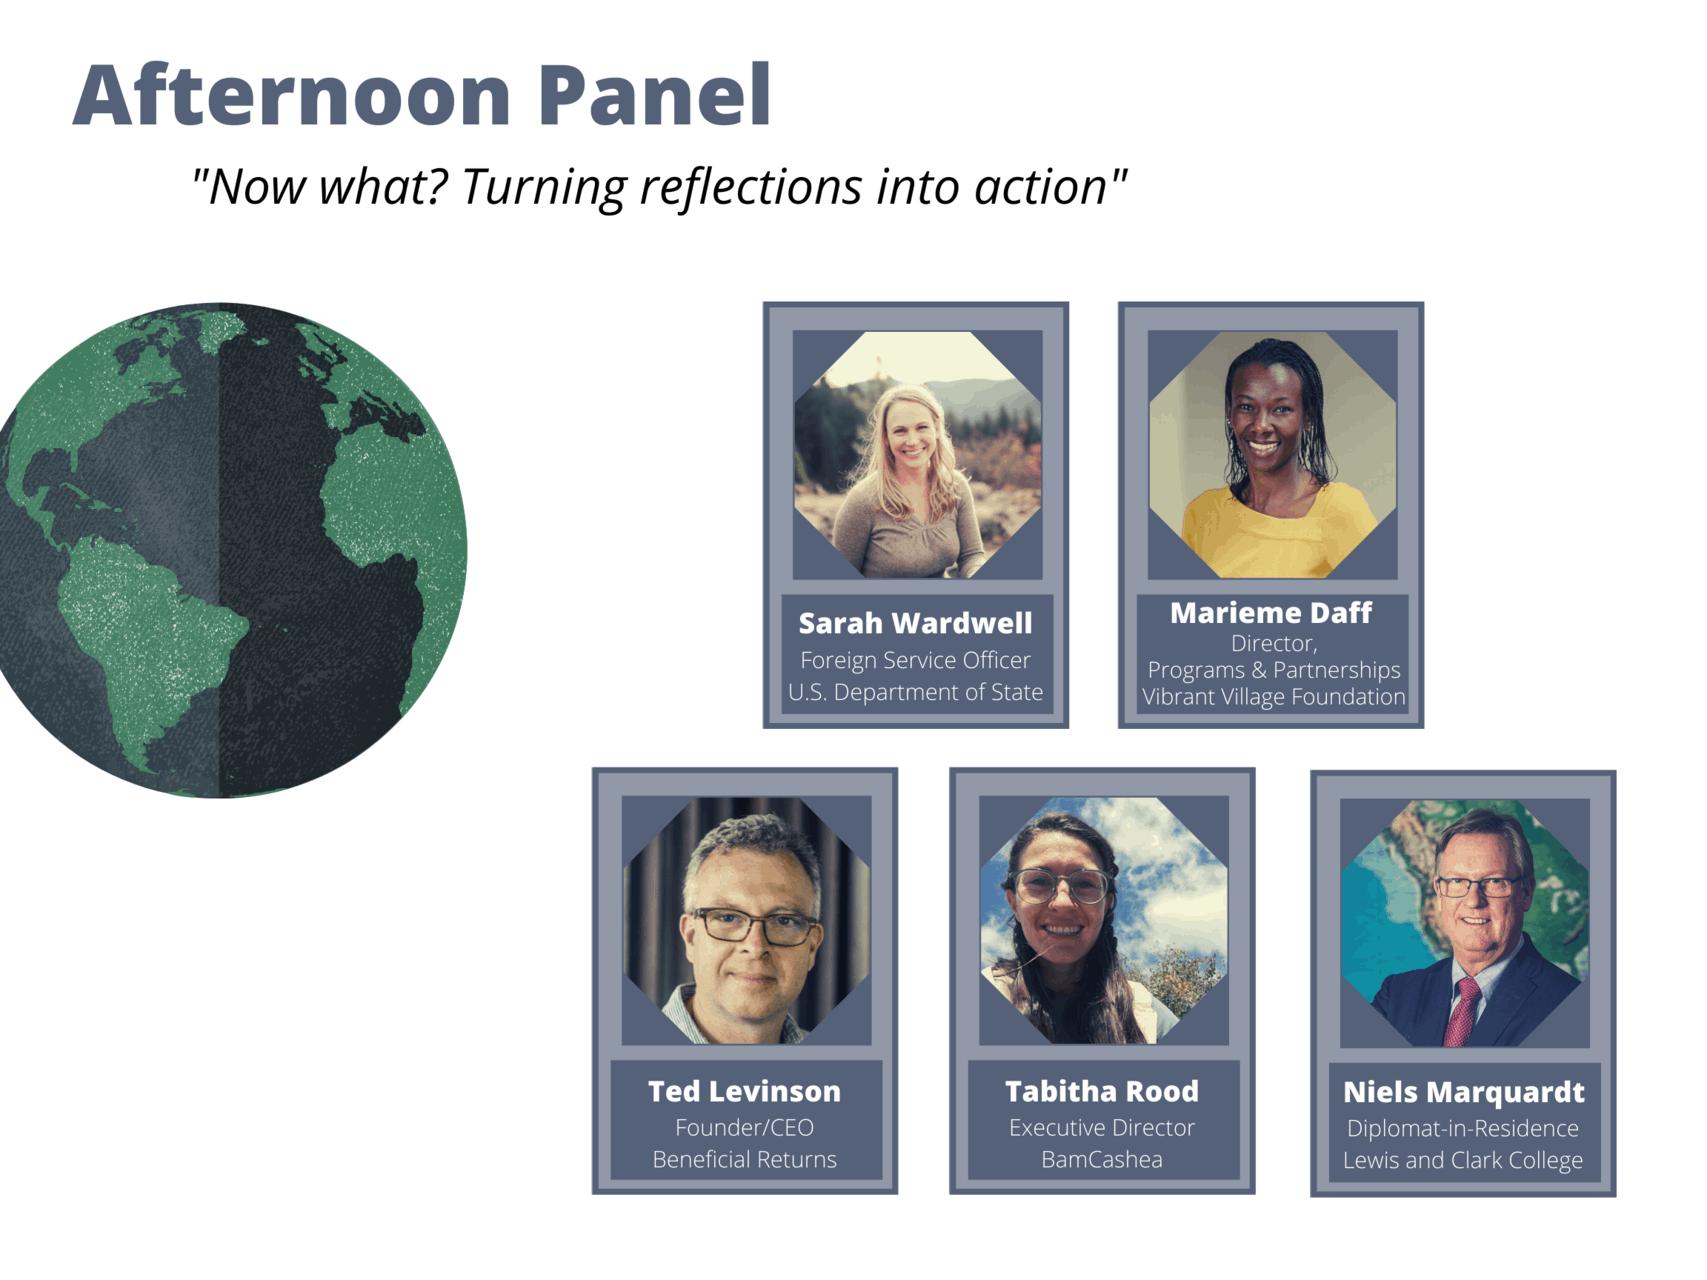 Afternoon Panel Speakers